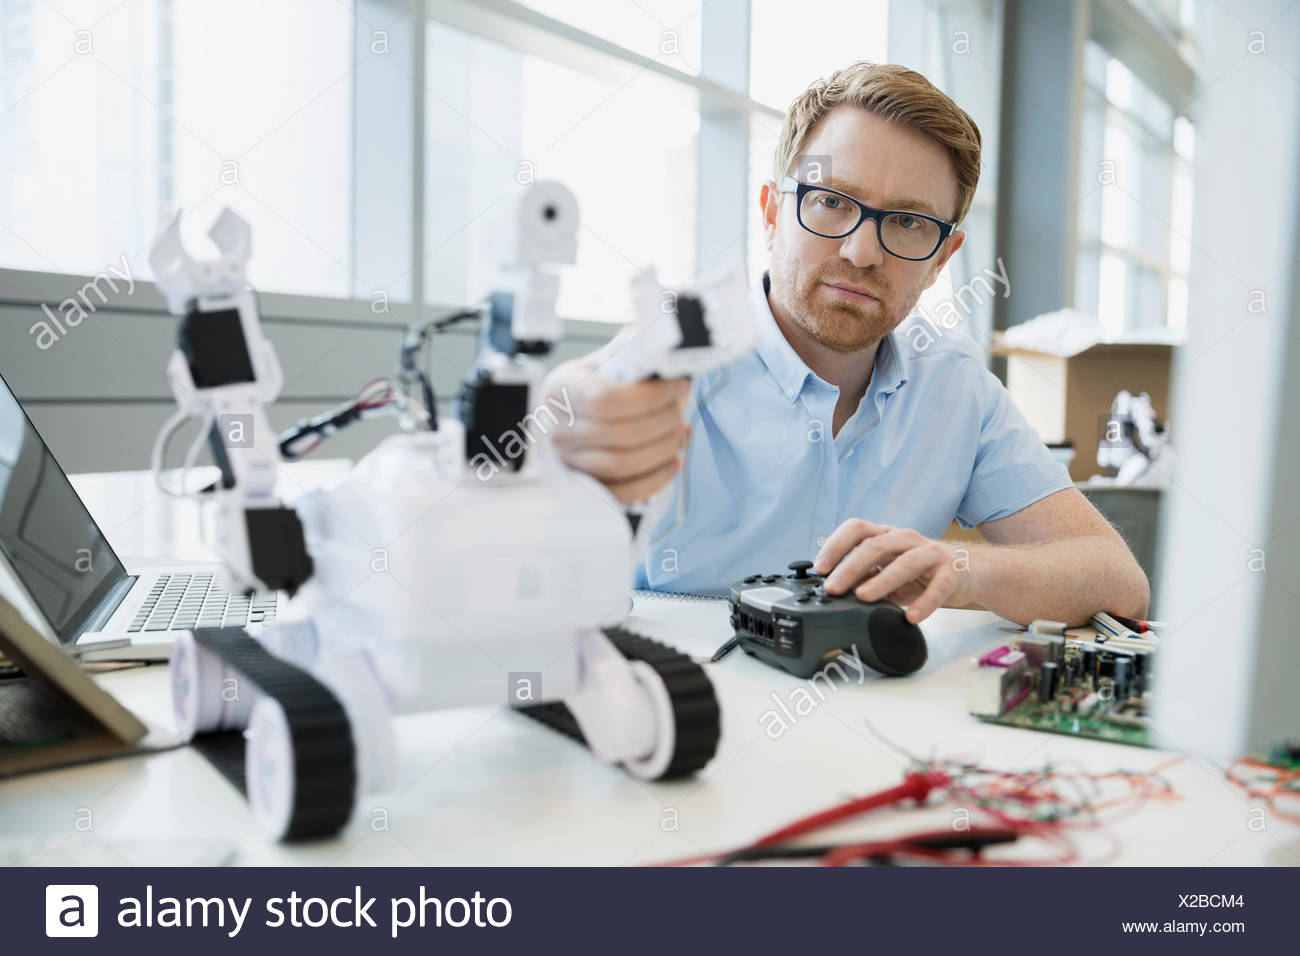 Focused engineer with joystick testing robot - Stock Image